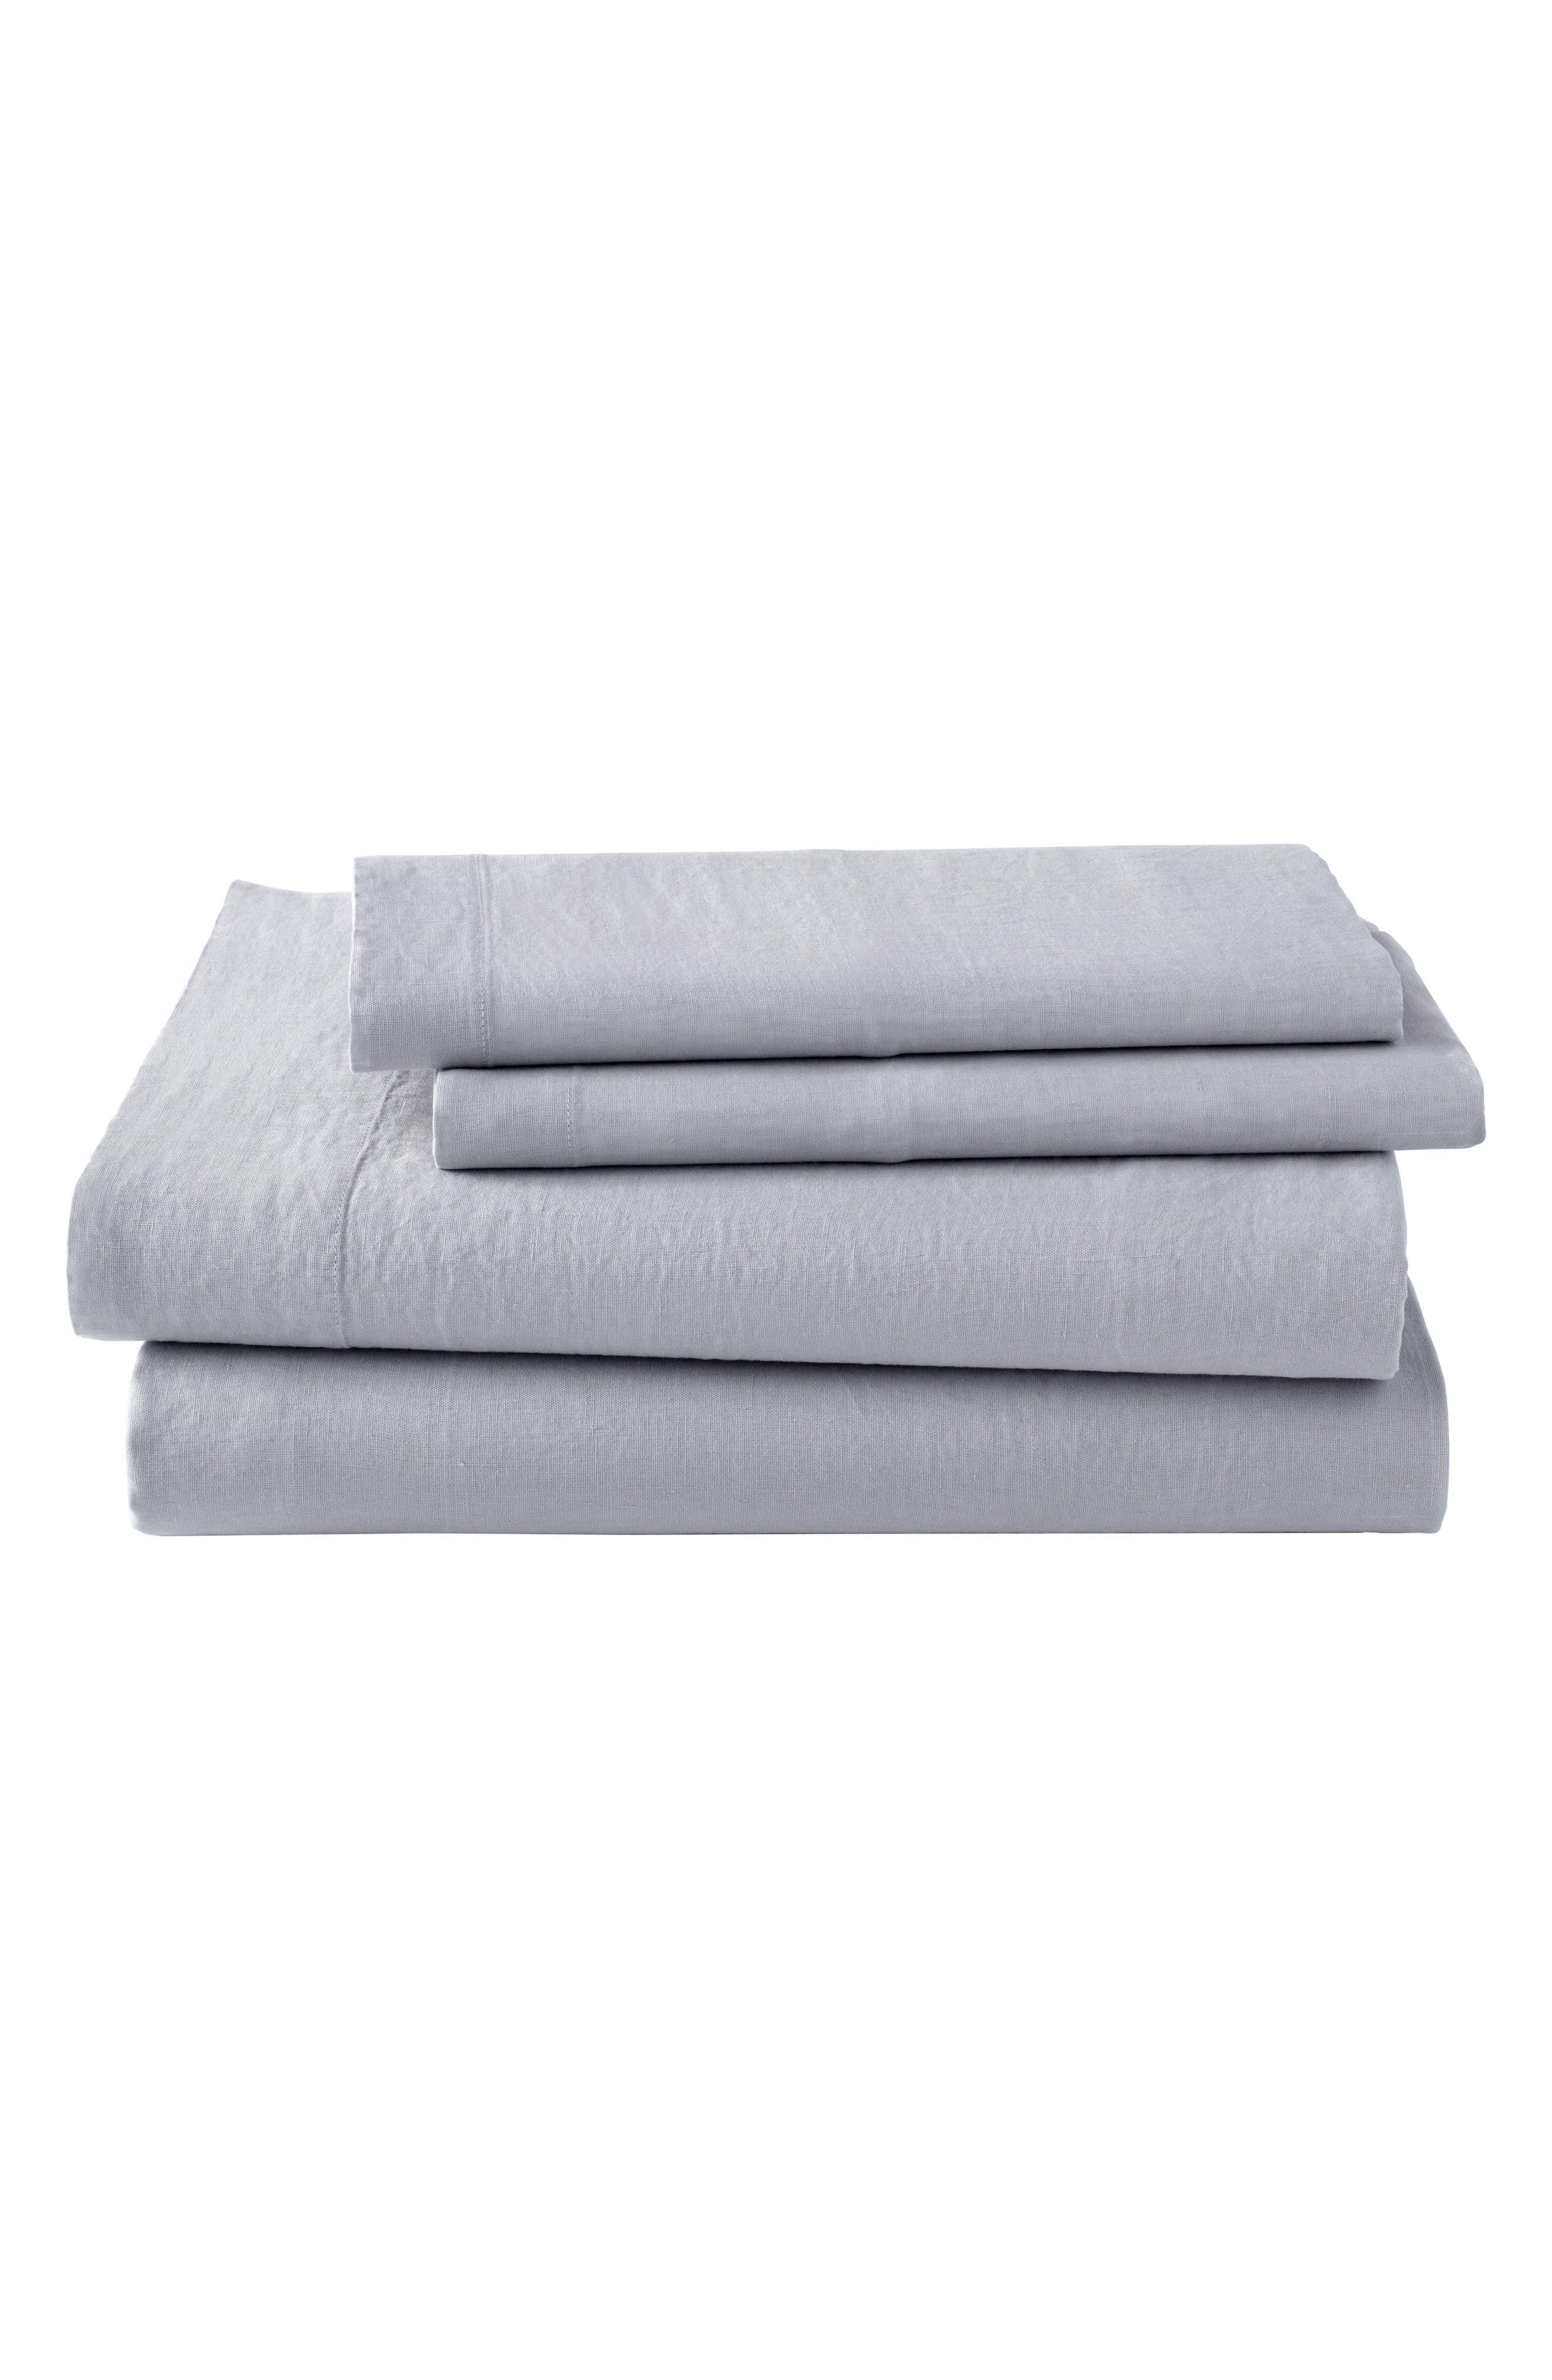 Alternate Image 1 Selected - KASSATEX Lino Linen 300 Thread Count Pillowcase